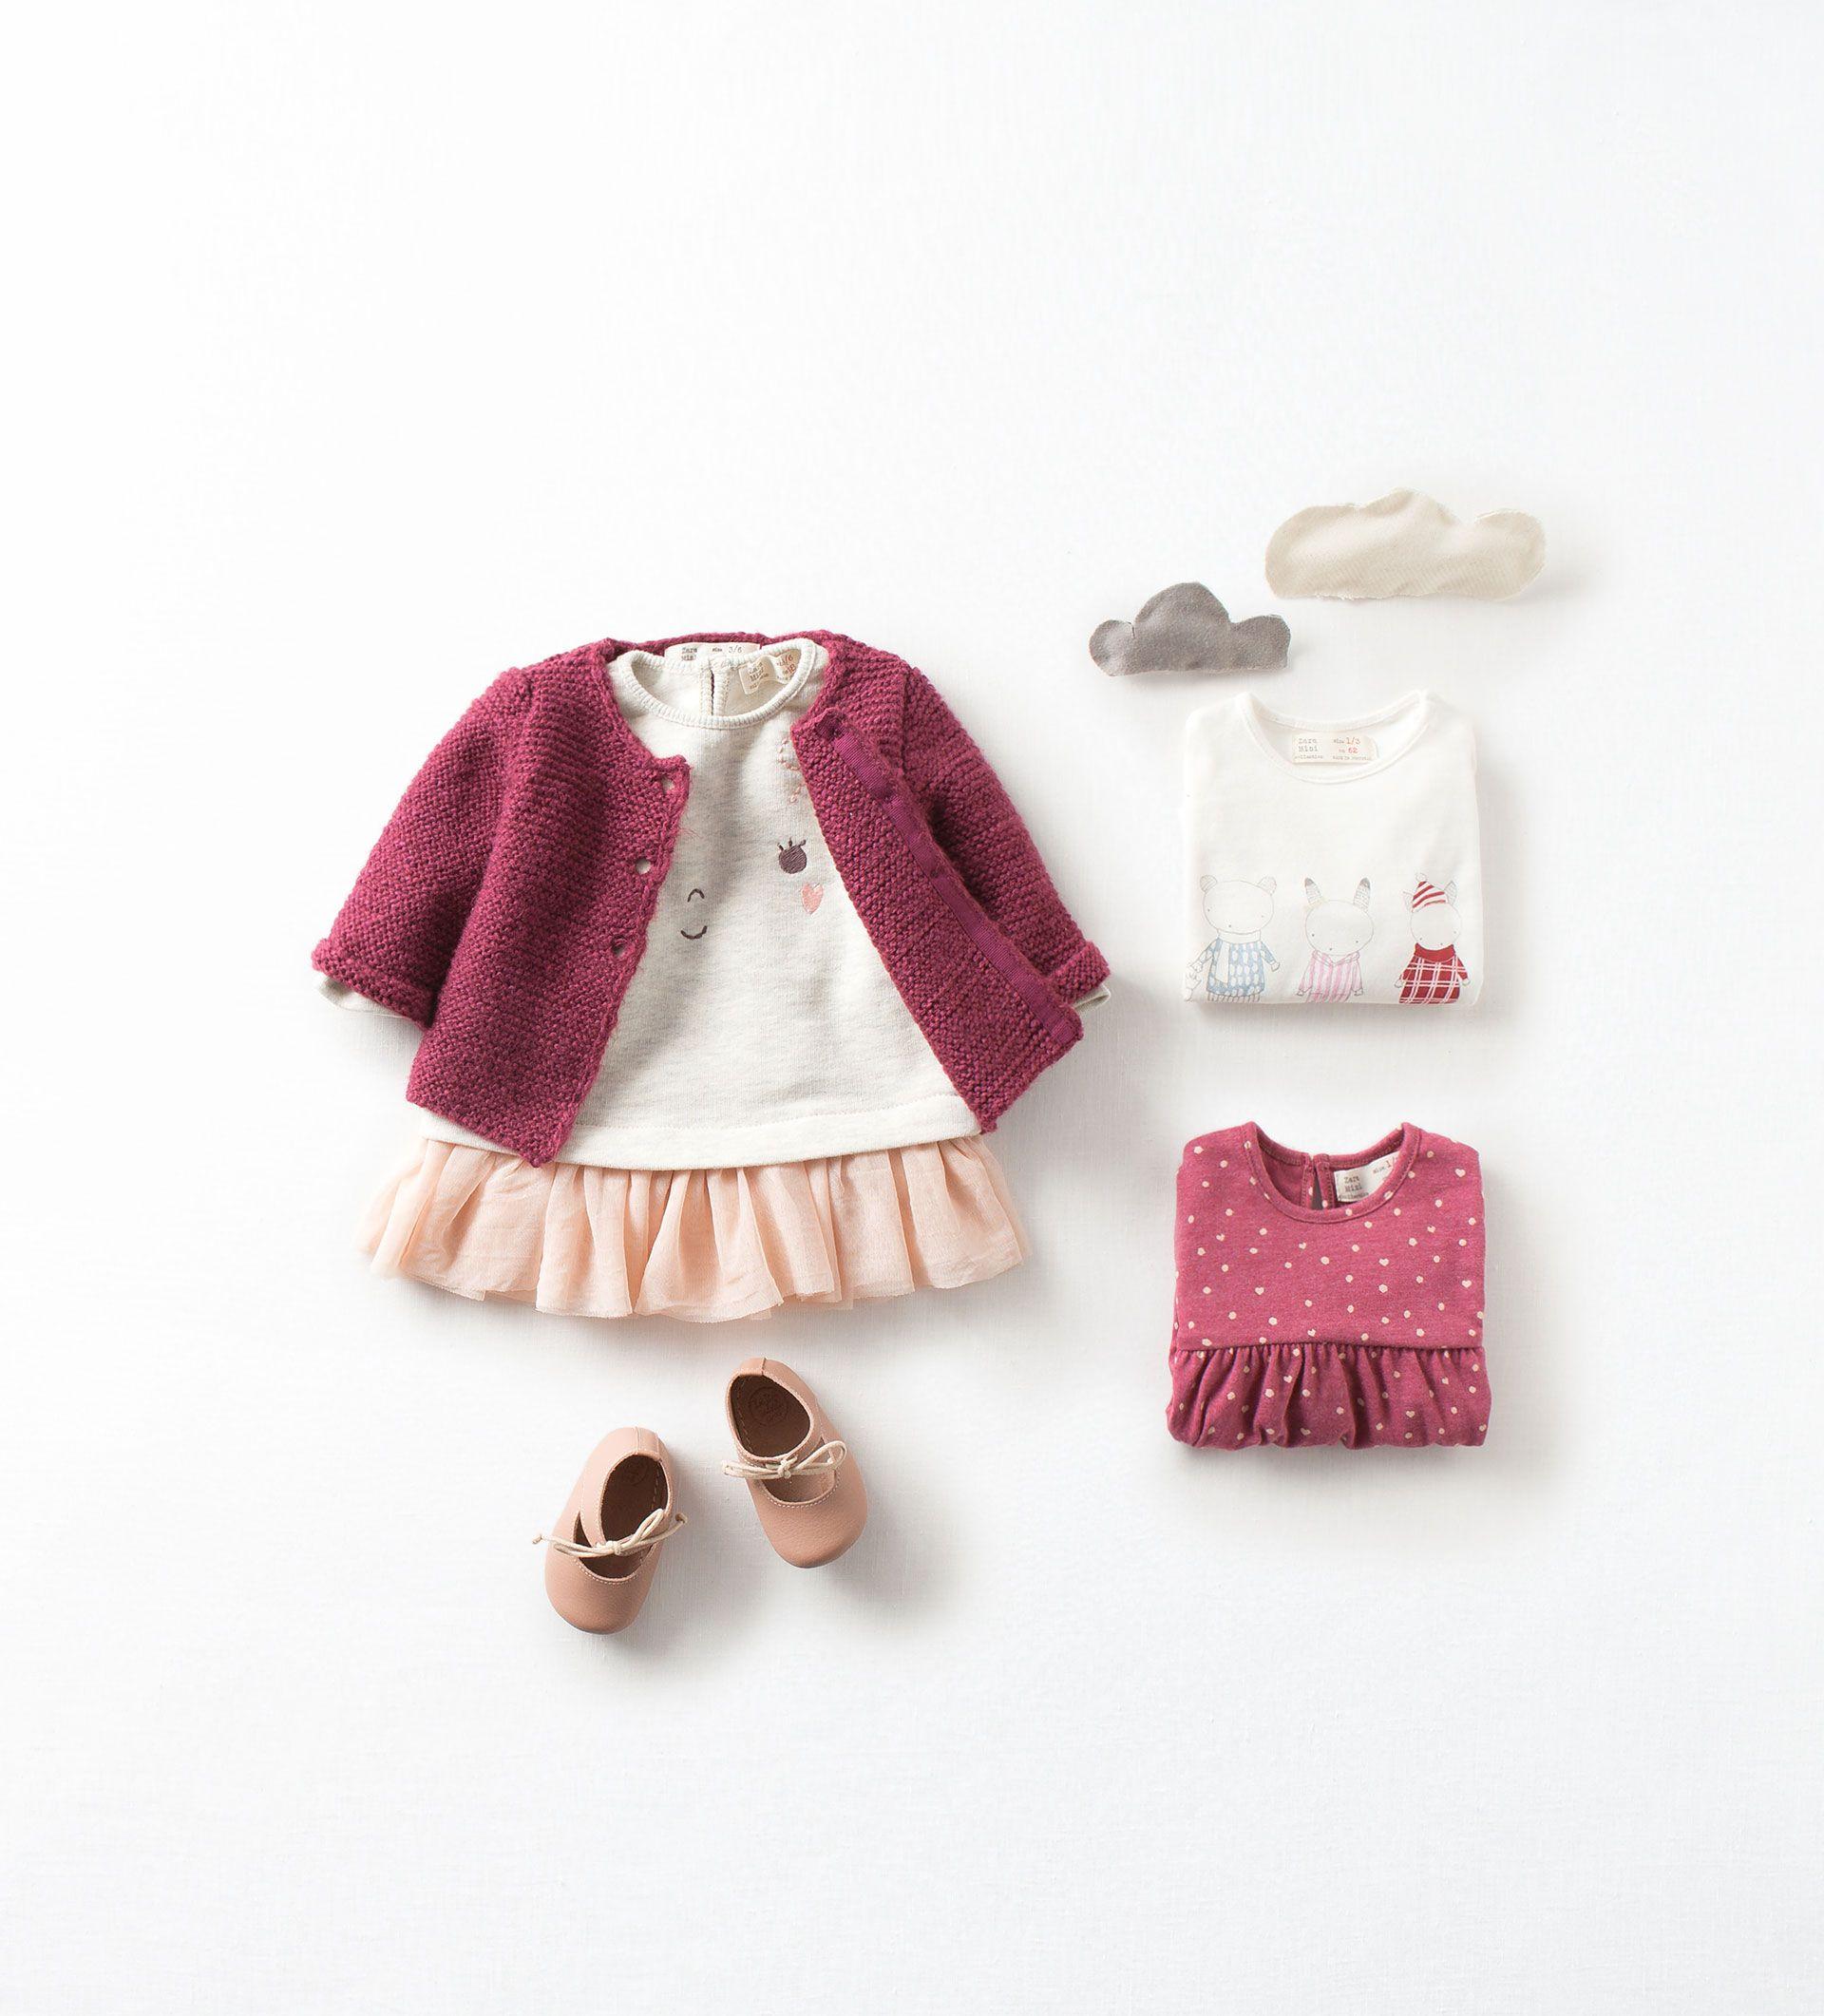 image 1 of from zara kids fashion pinterest kinderbekleidung kinder kleidung und babysachen. Black Bedroom Furniture Sets. Home Design Ideas